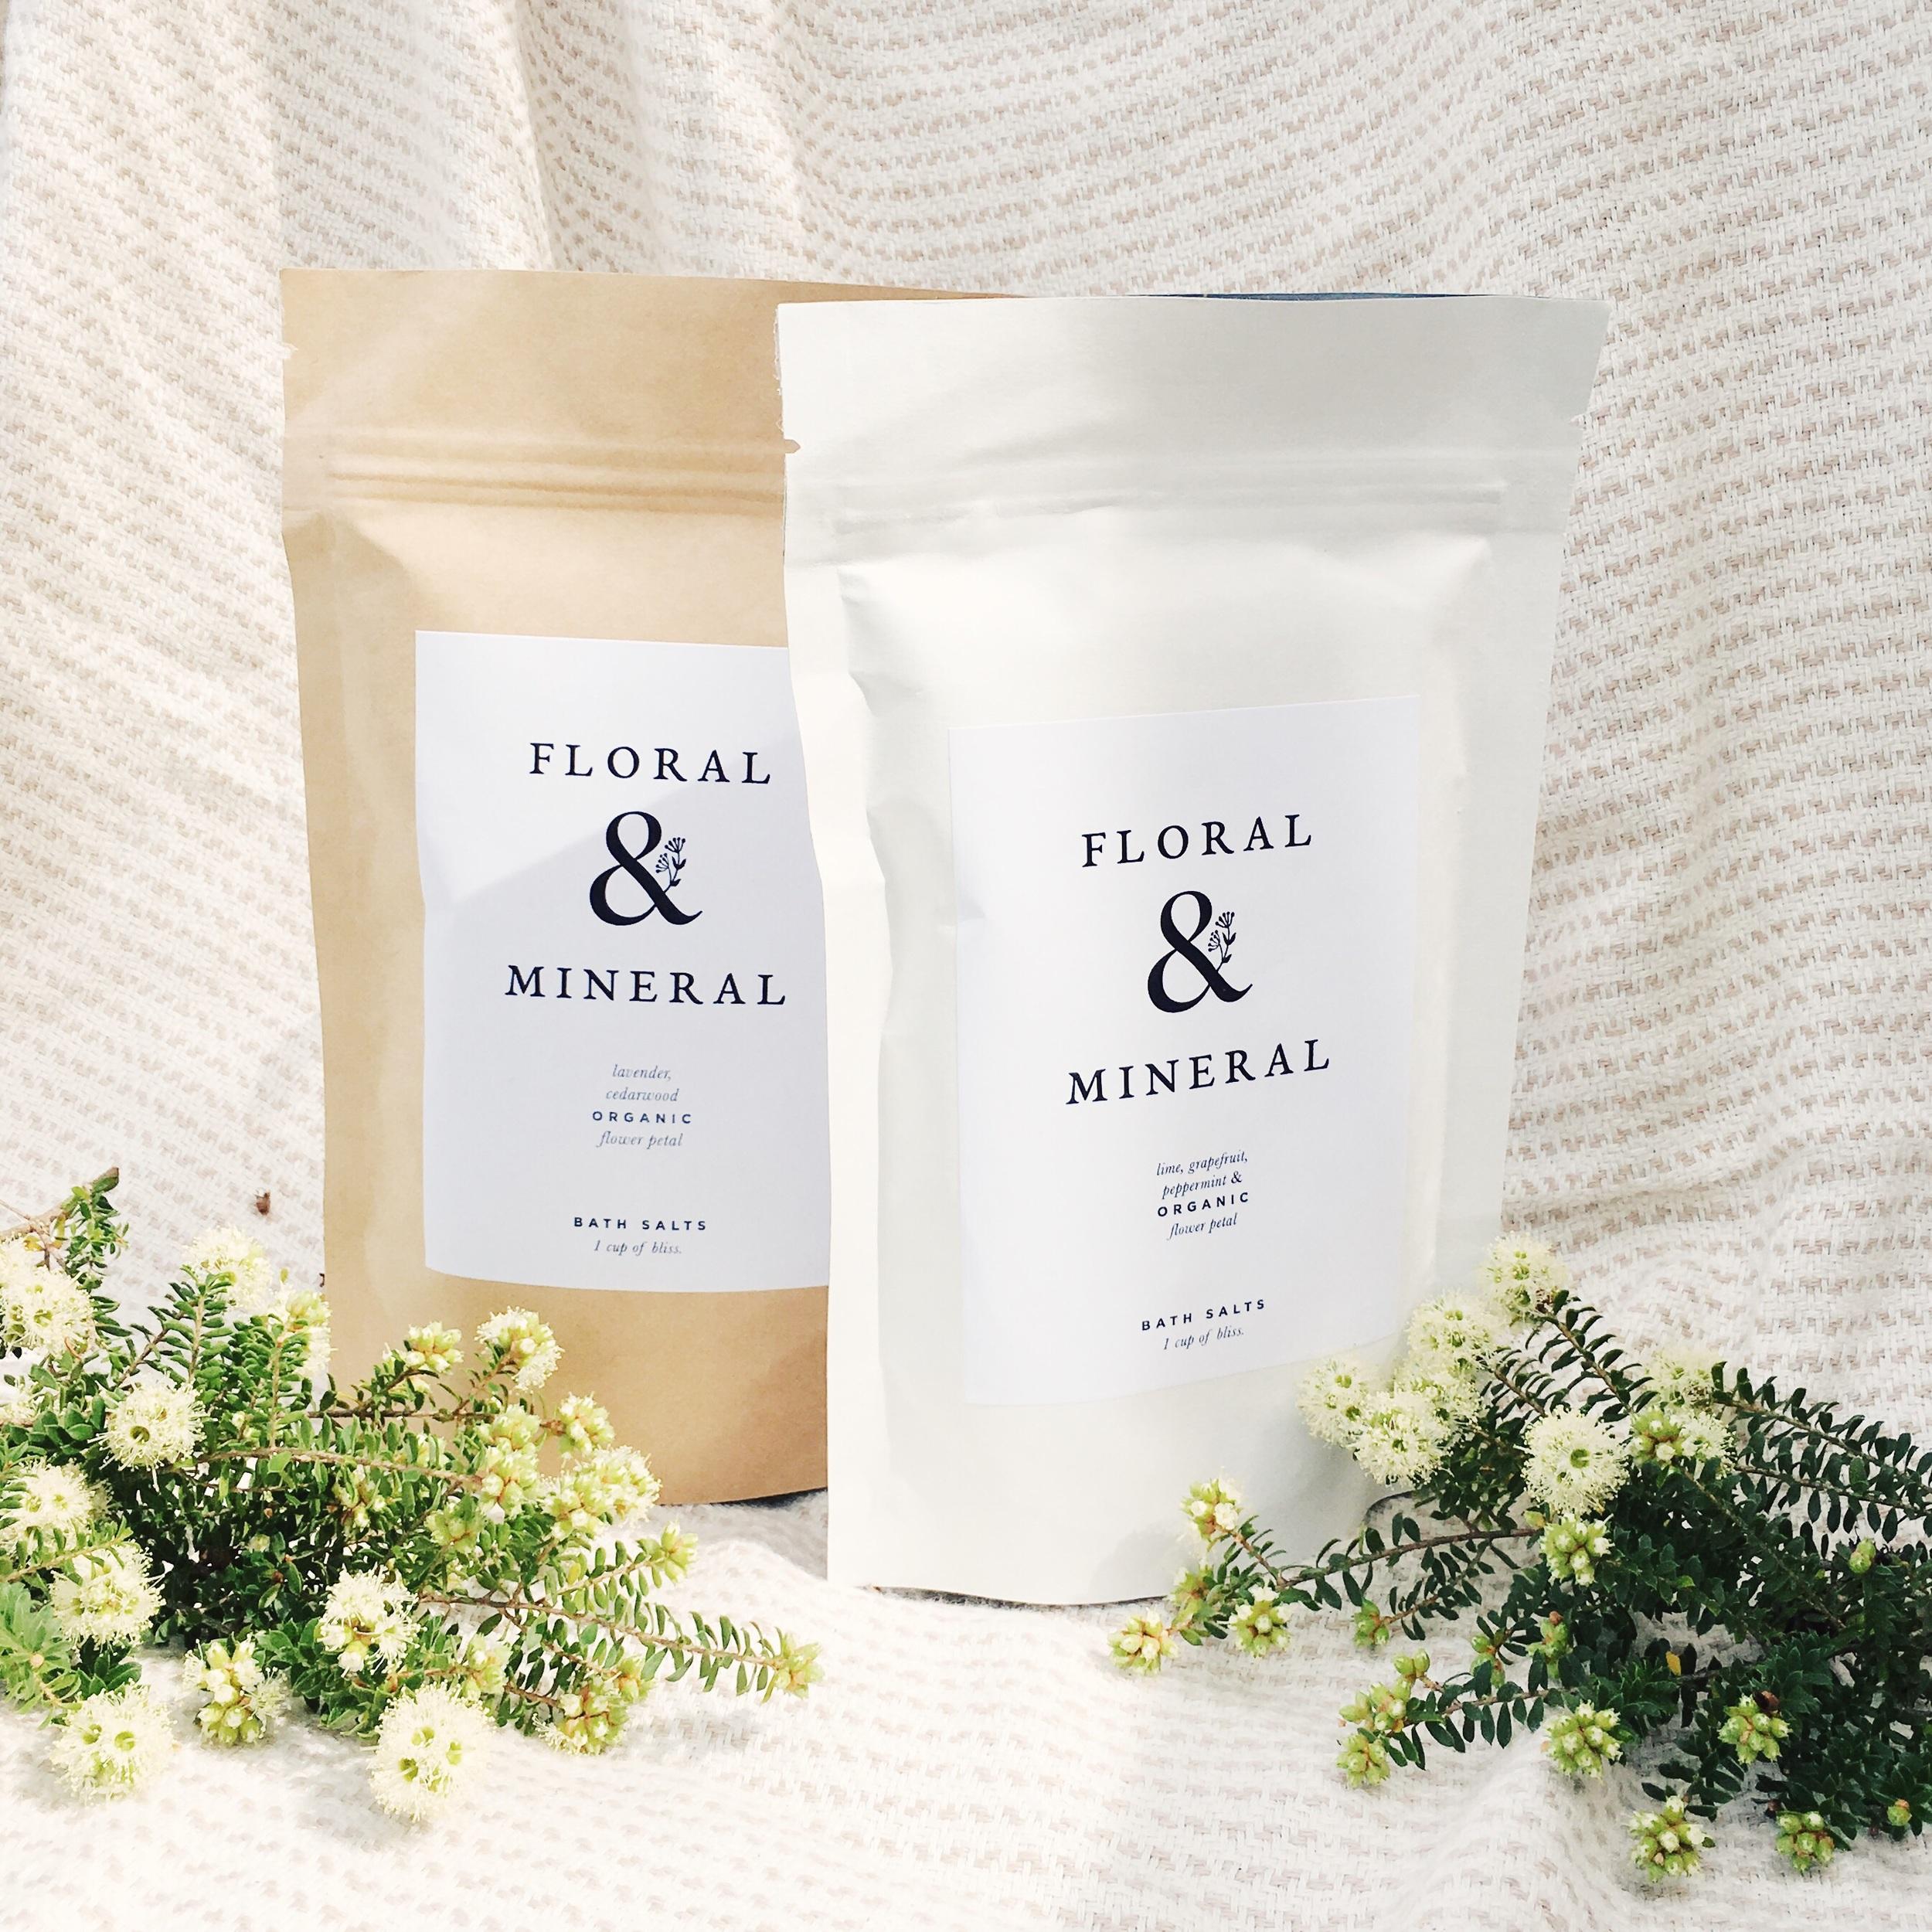 flora-mineral-the-honest-jones